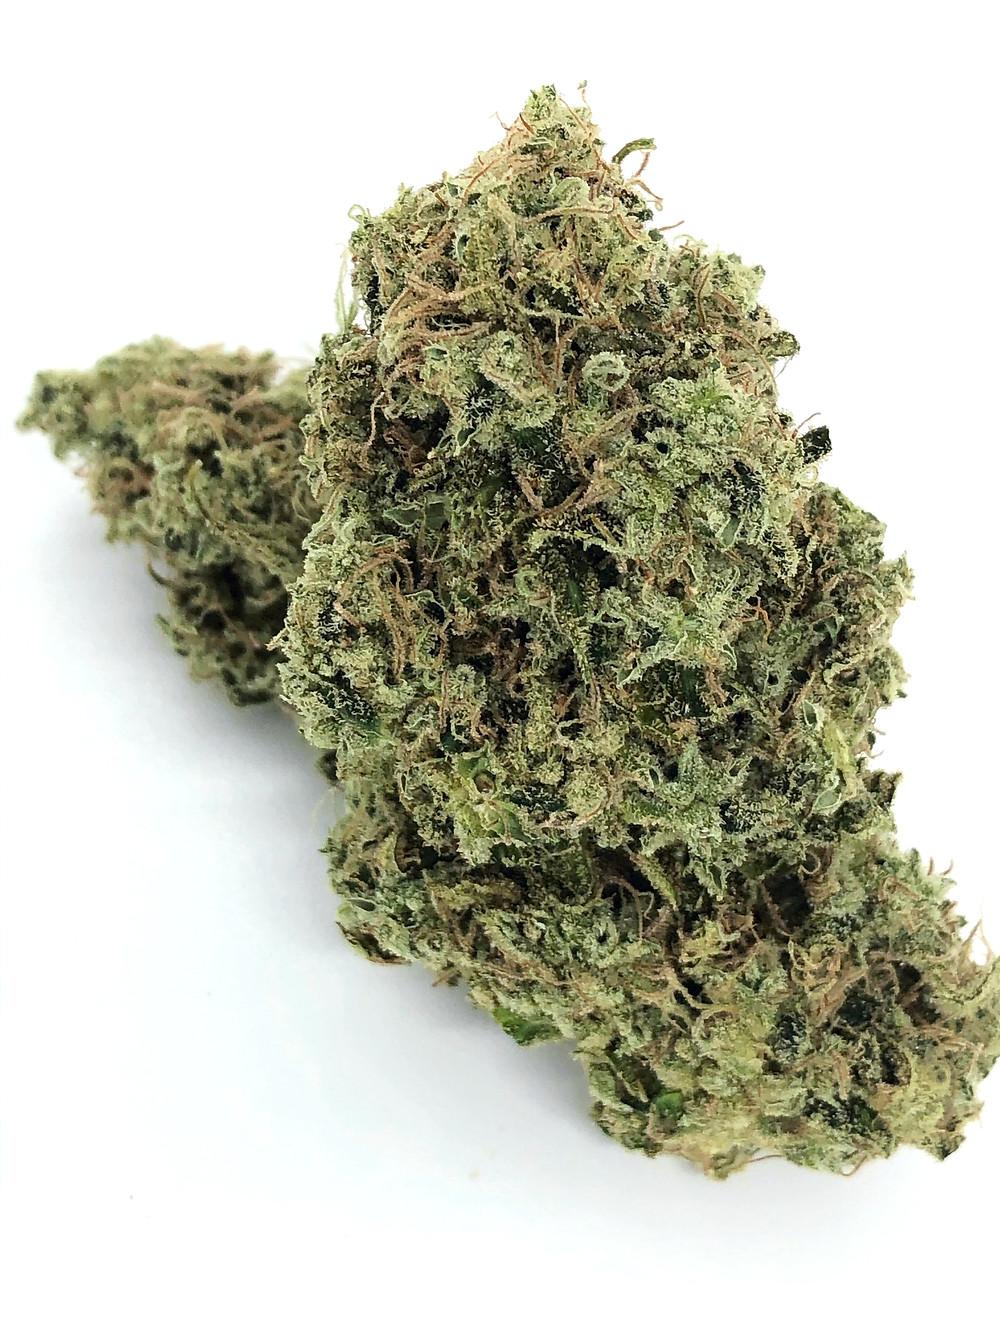 lemon-skunk-herbal-alternatives-dc-review-3